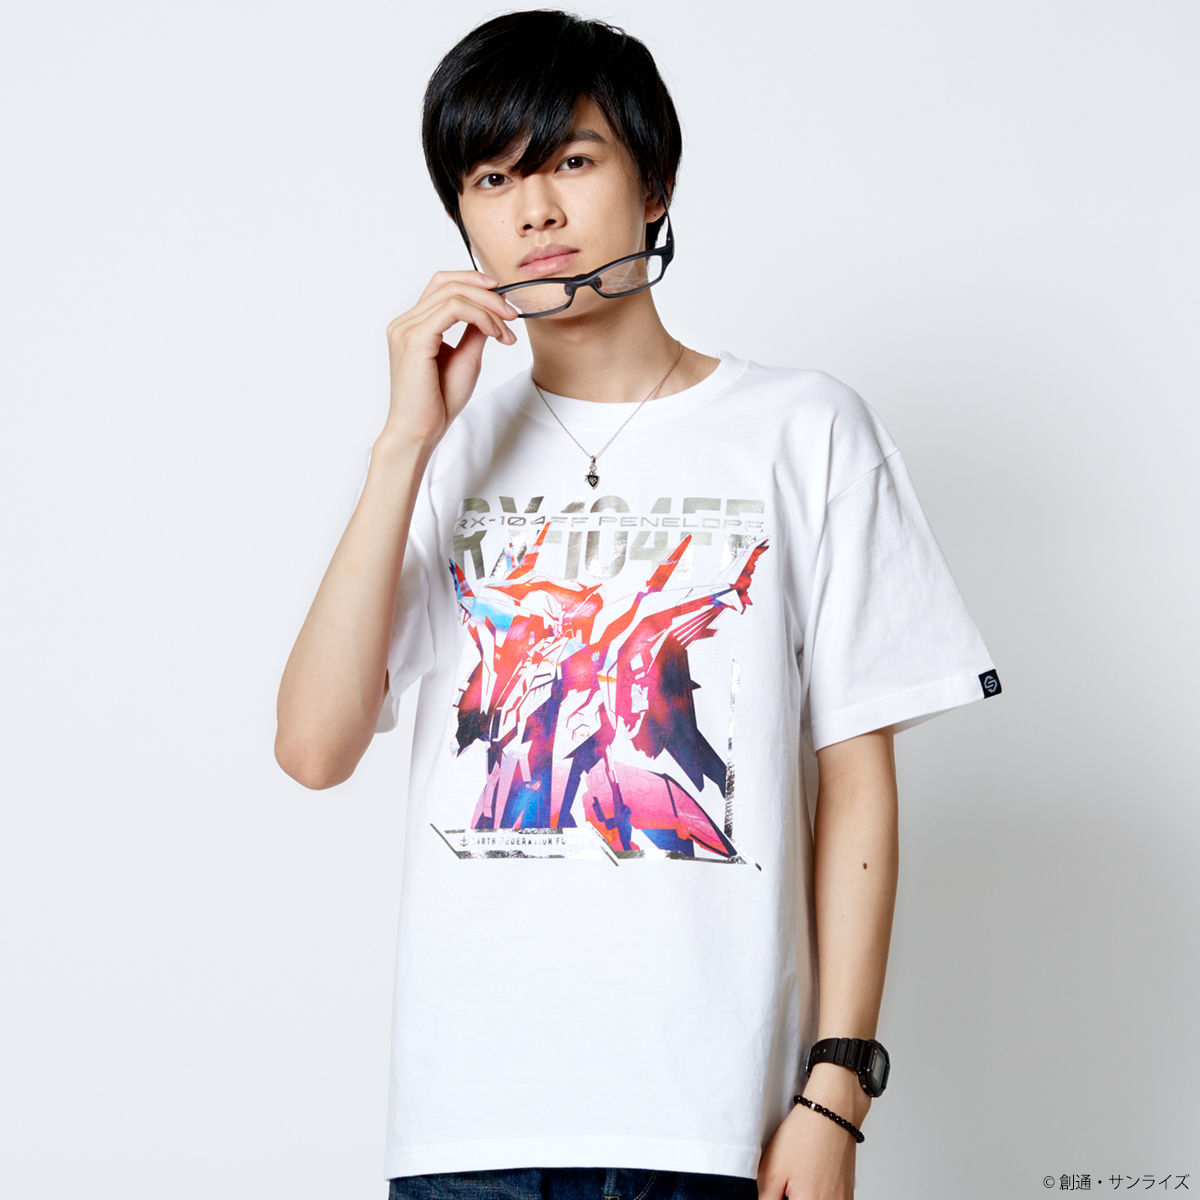 RX-104FF Penelope T-shirt—Mobile Suit Gundam Hathaway/STRICT-G Collaboration